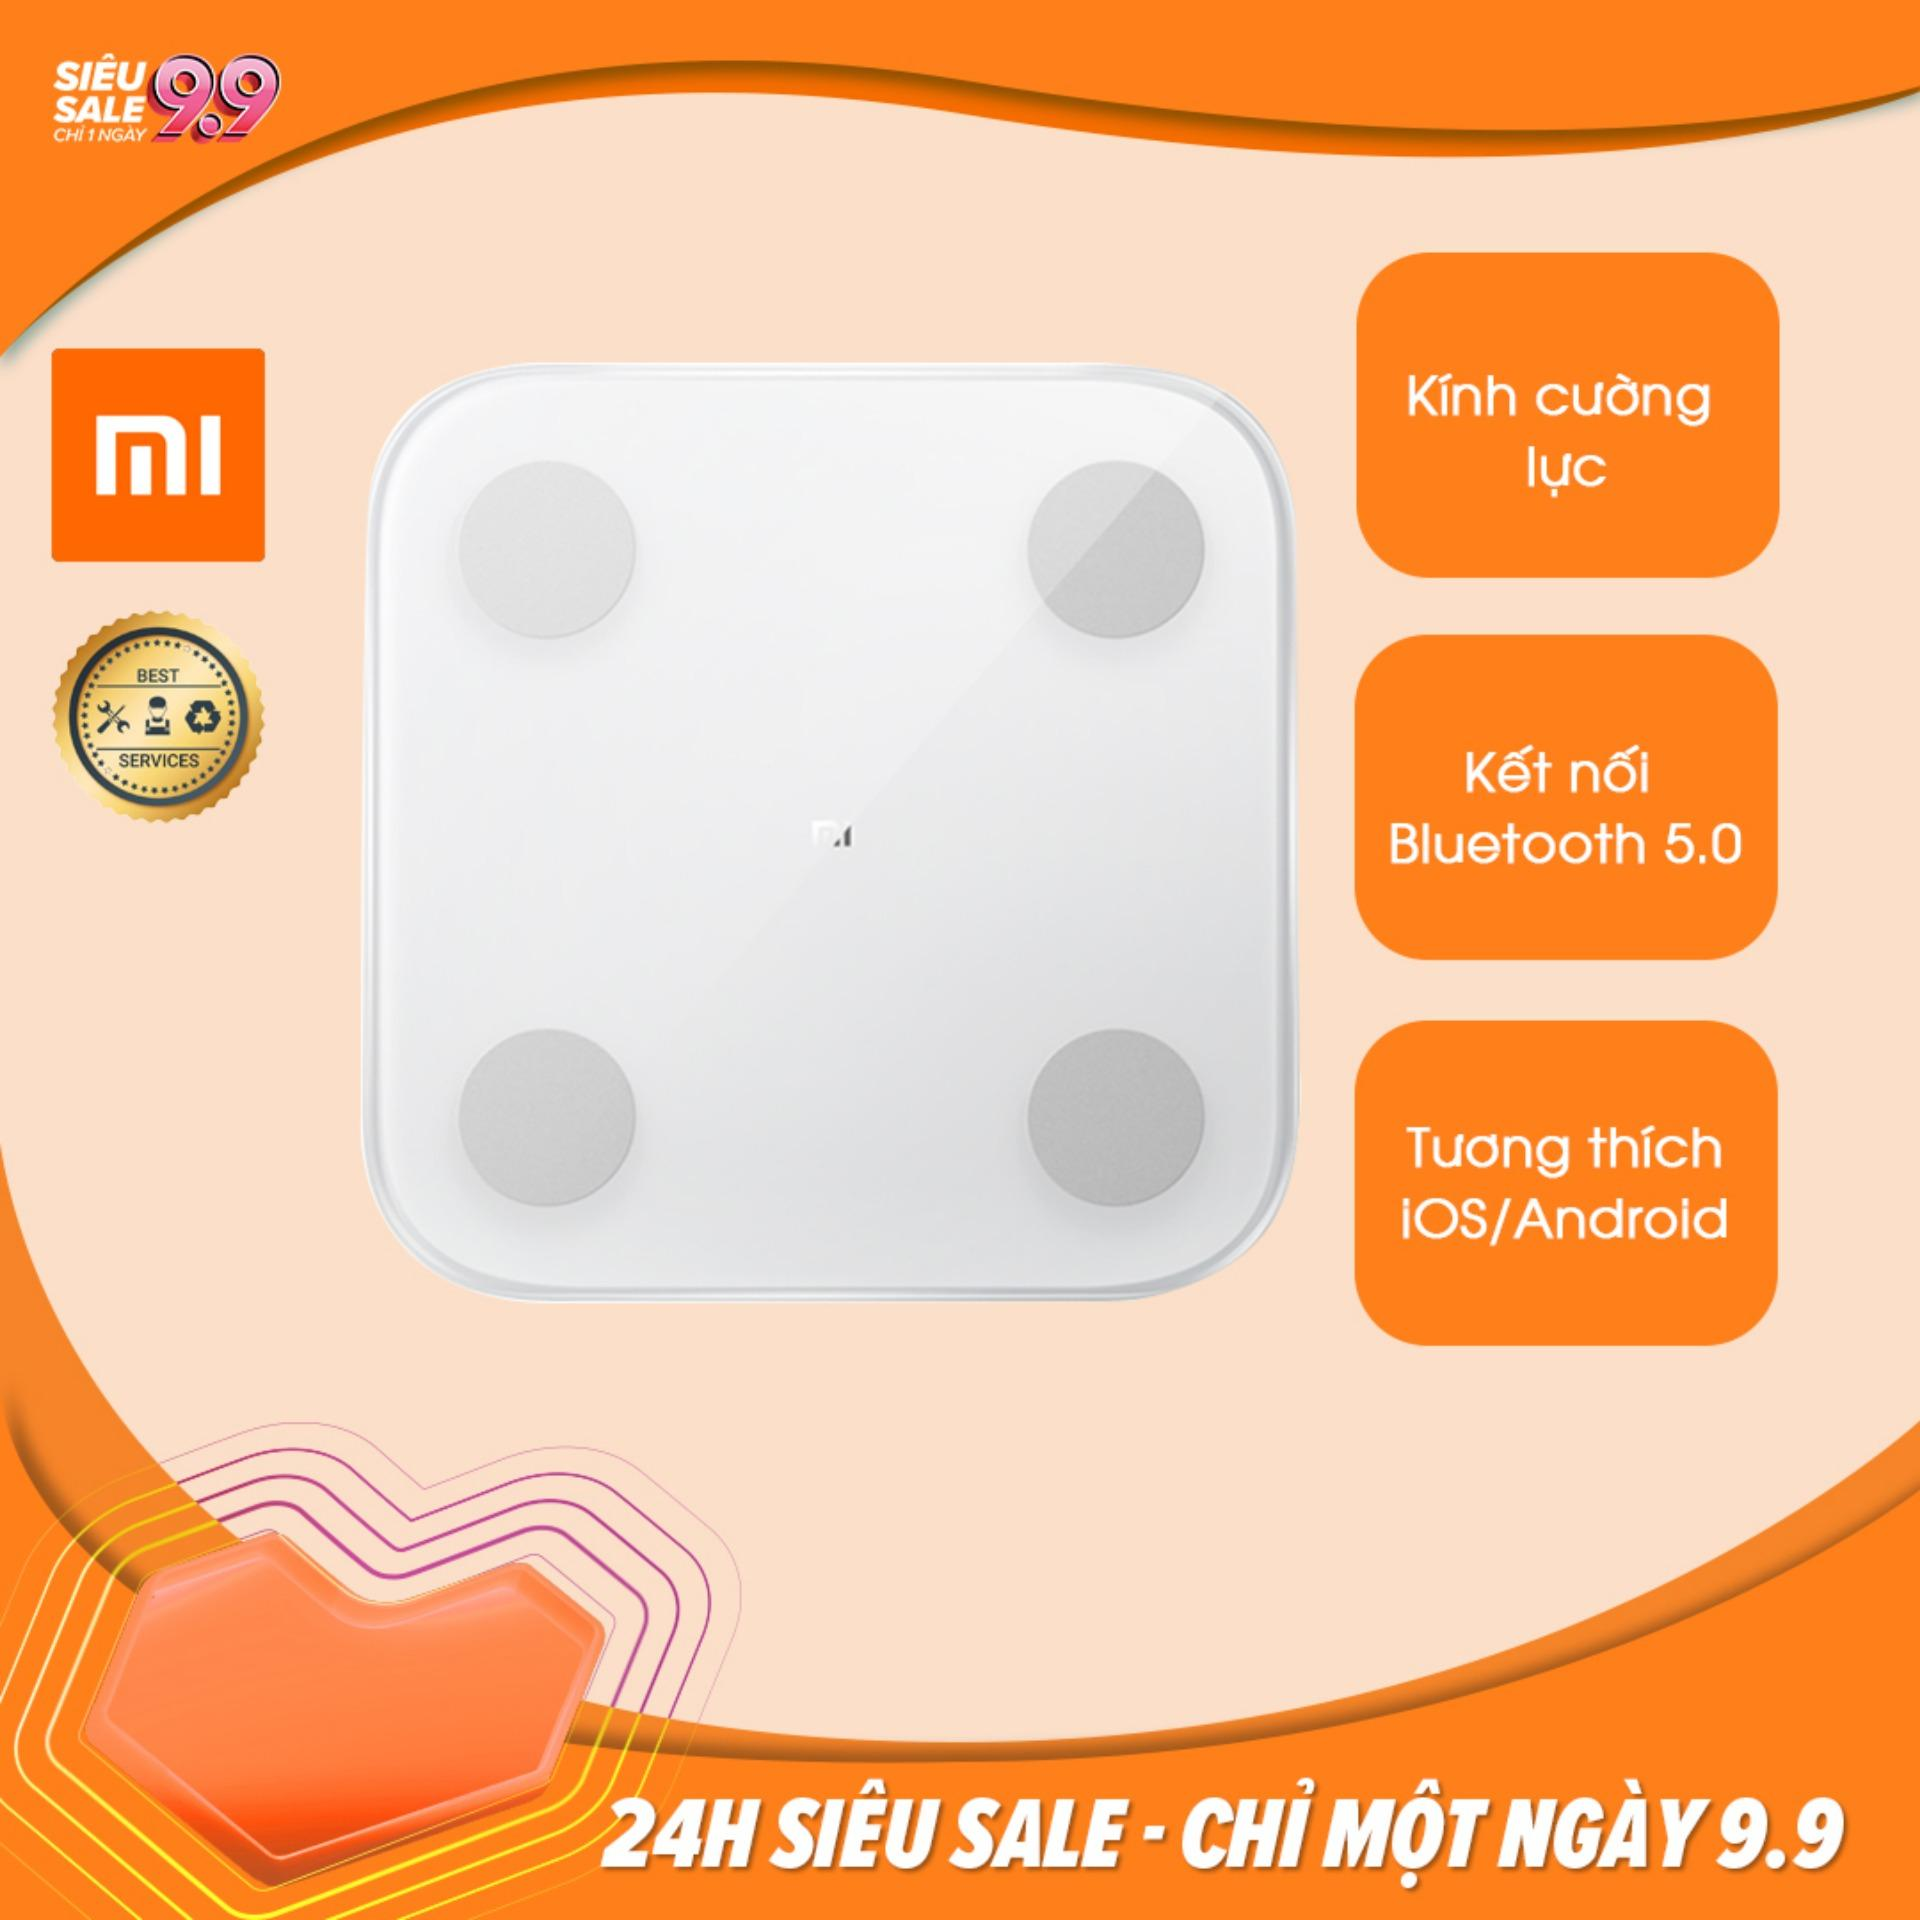 Cân thông minh Xiaomi Mi Body Composition Scale 2 ( Gen 2 ) nhập khẩu